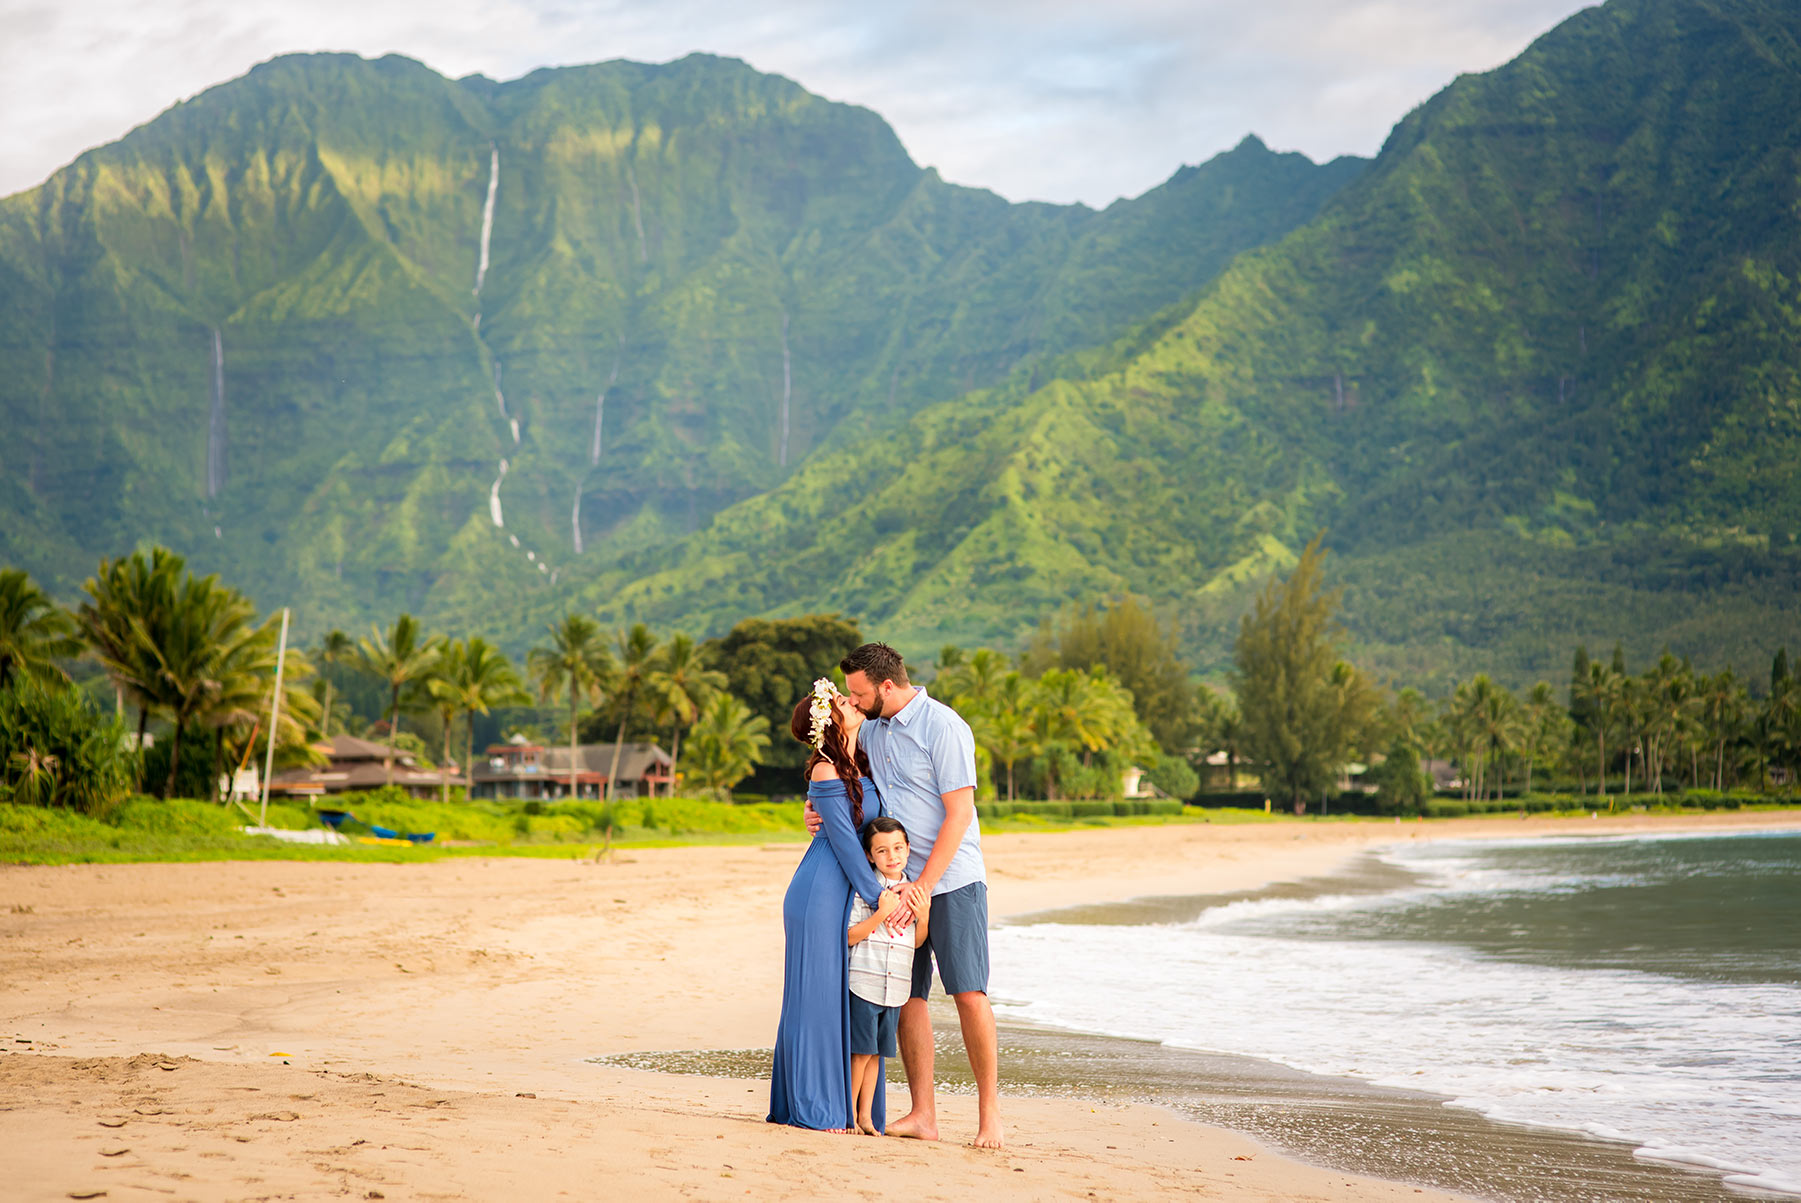 Wedding photography in Hanalei Bay, Kauai.